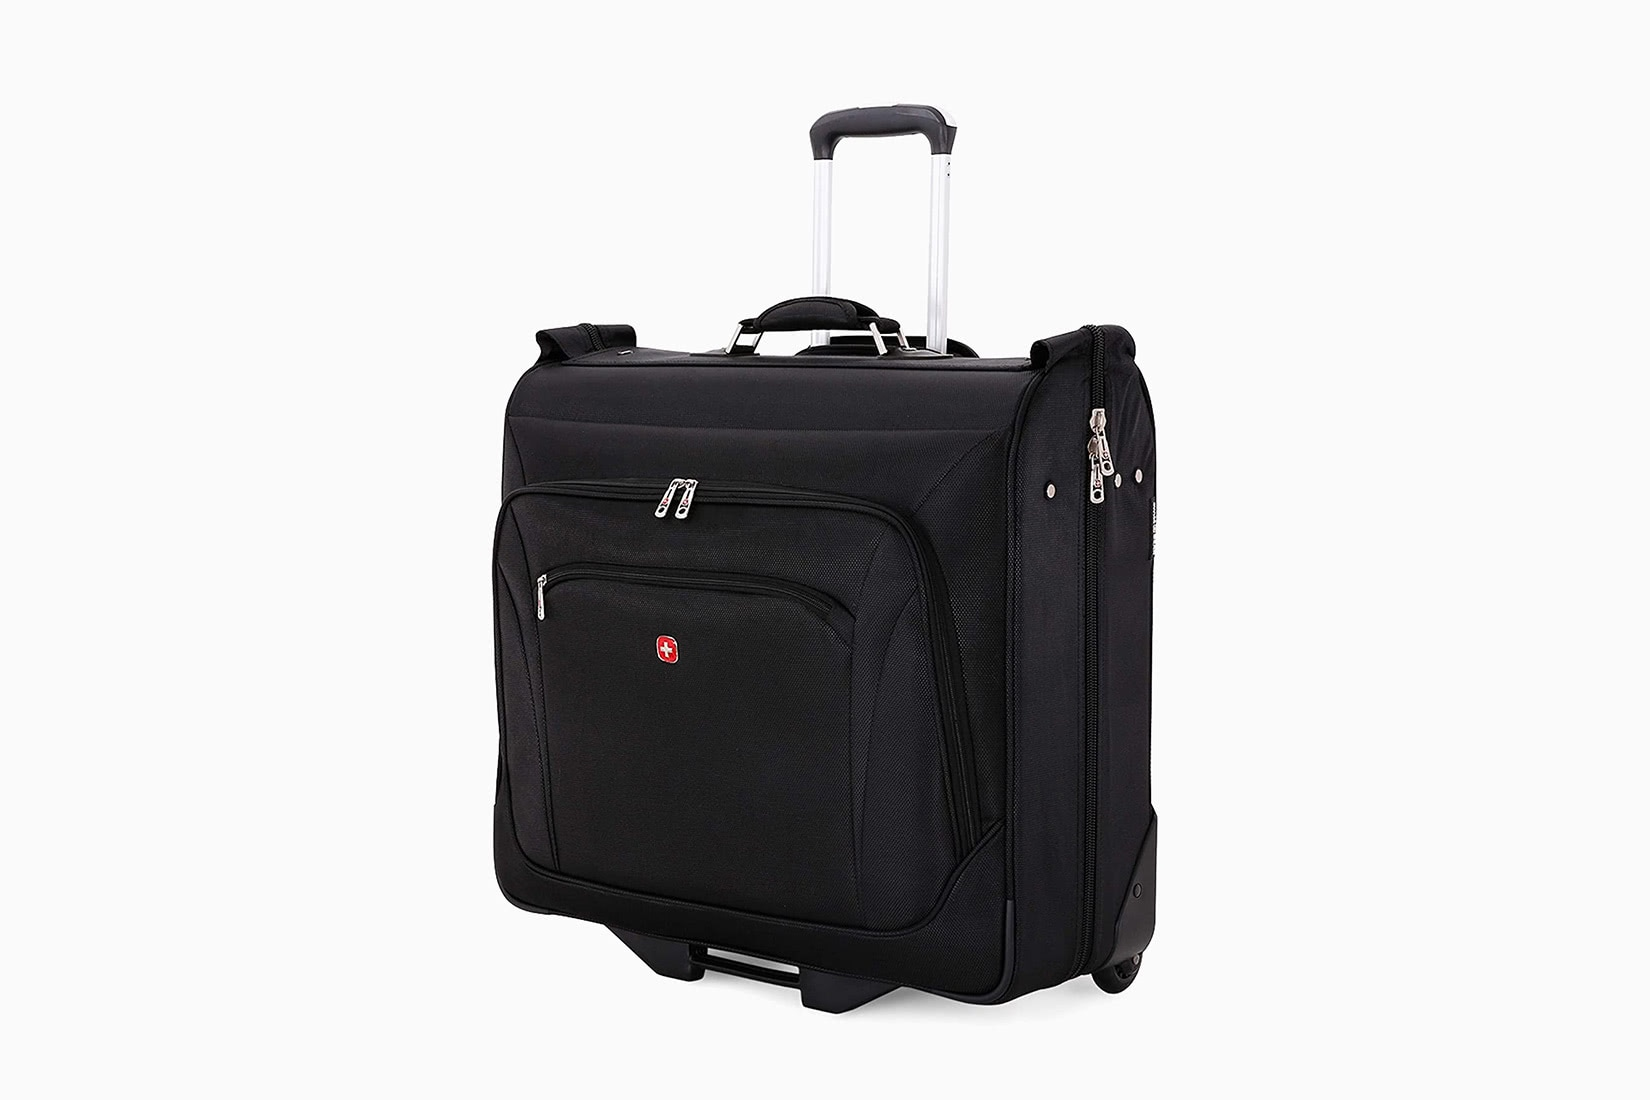 best garment bags rolling suitcase swissgear review - Luxe Digital